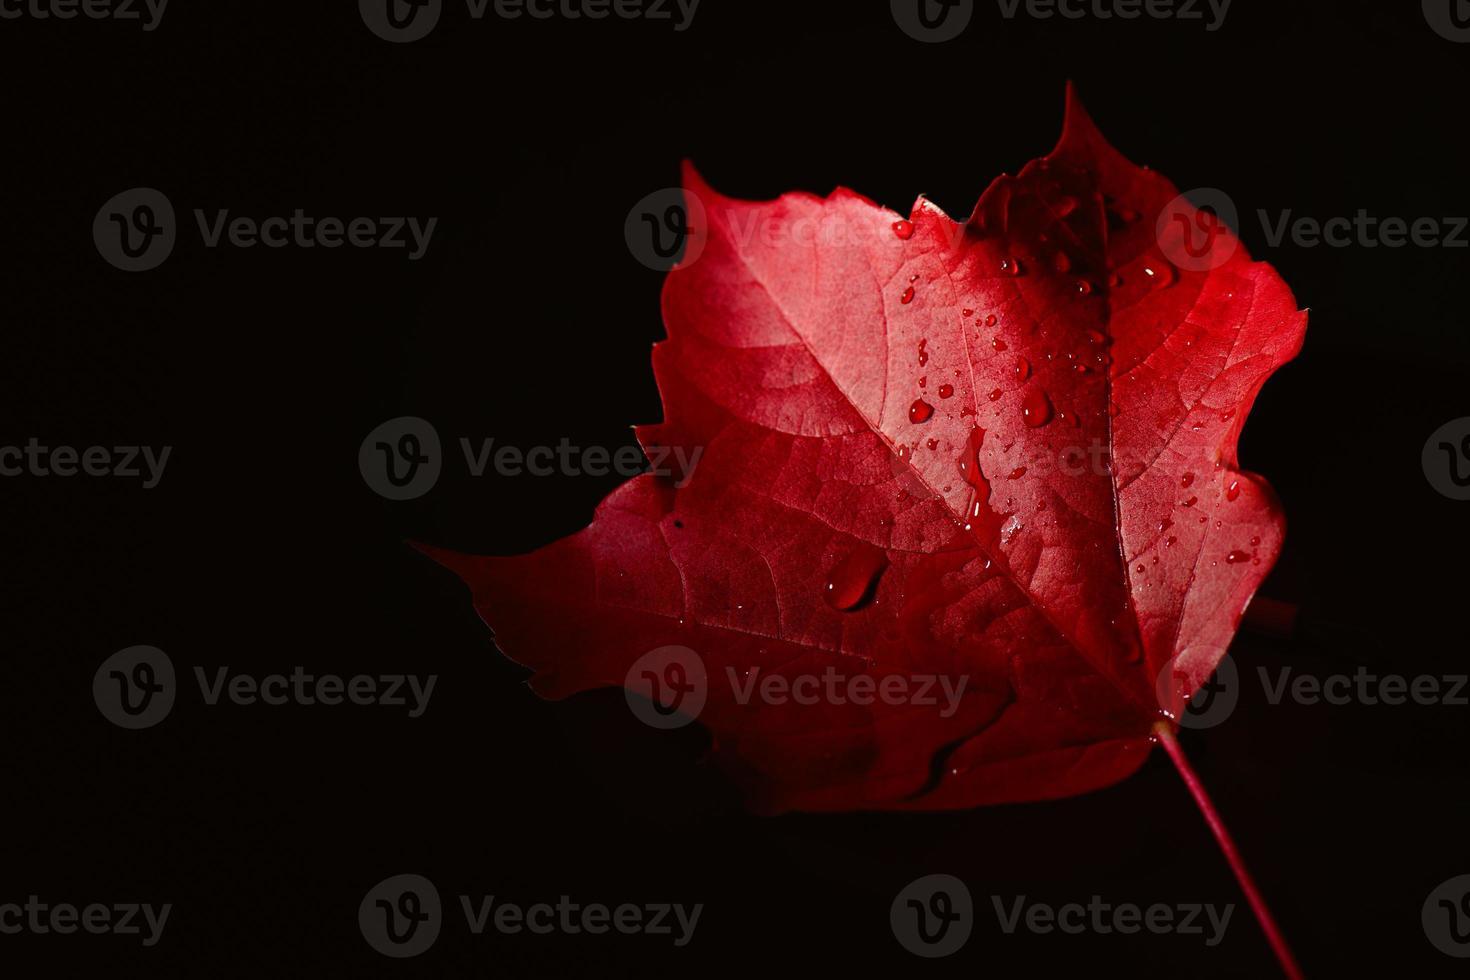 hoja de otoño roja con gotas de agua lloviendo foto